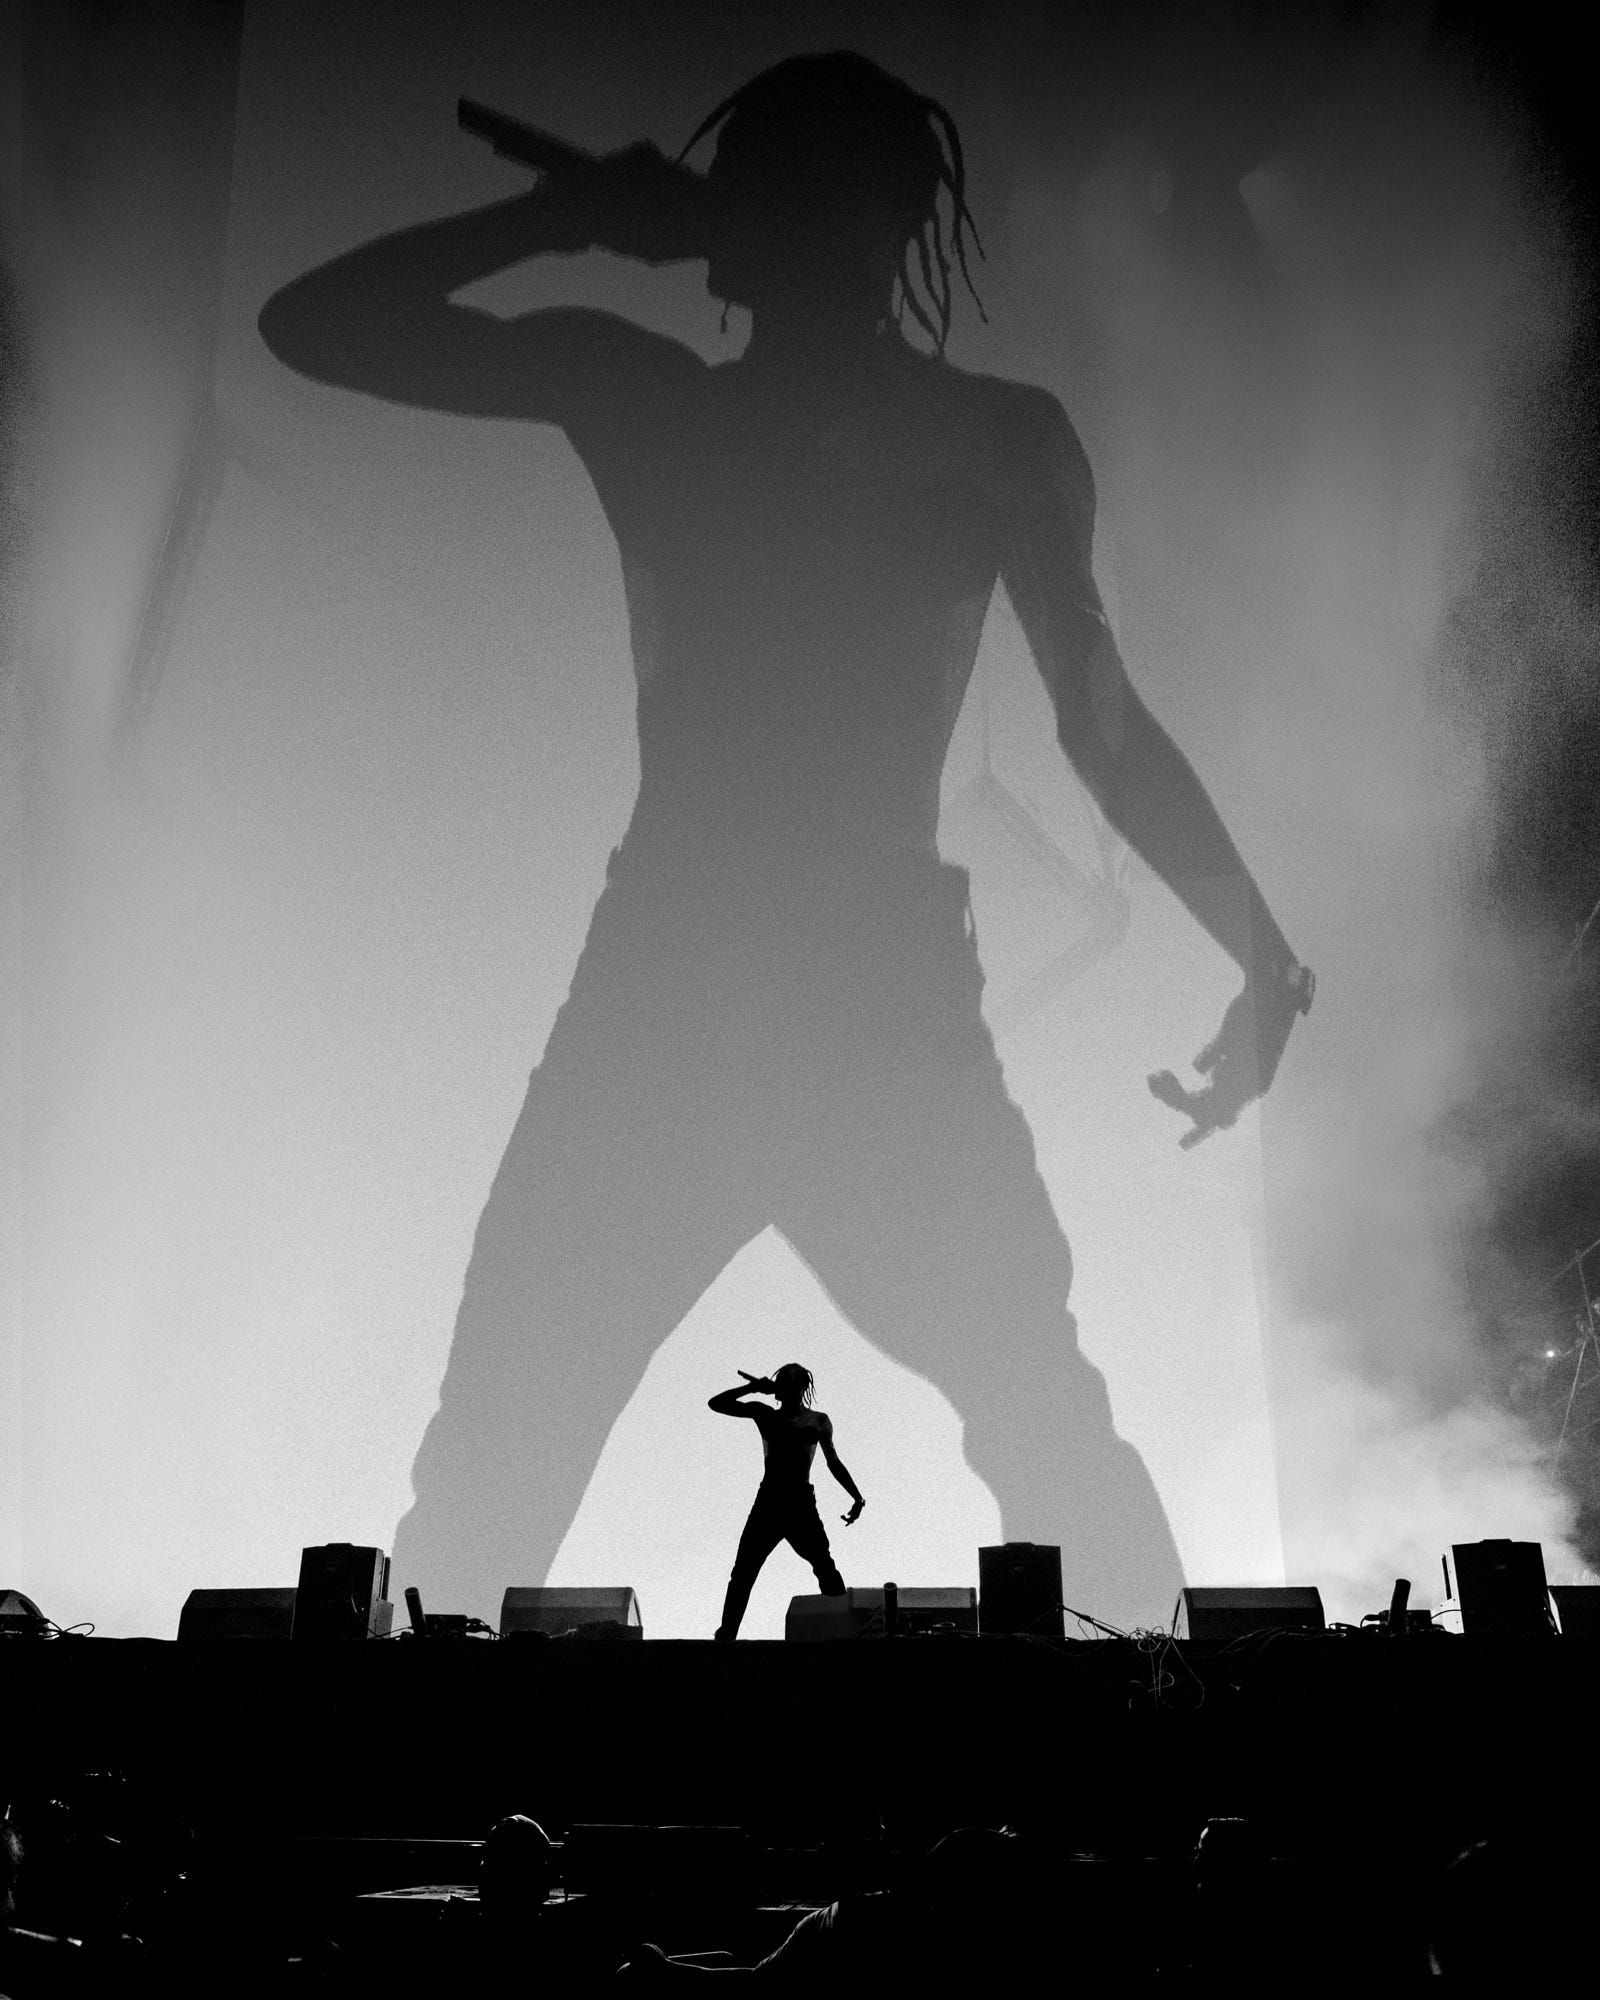 杰森 彼得森的天文世界 照片269826177 500px Travis Scott Concert Travis Scott Wallpapers Black And White Picture Wall